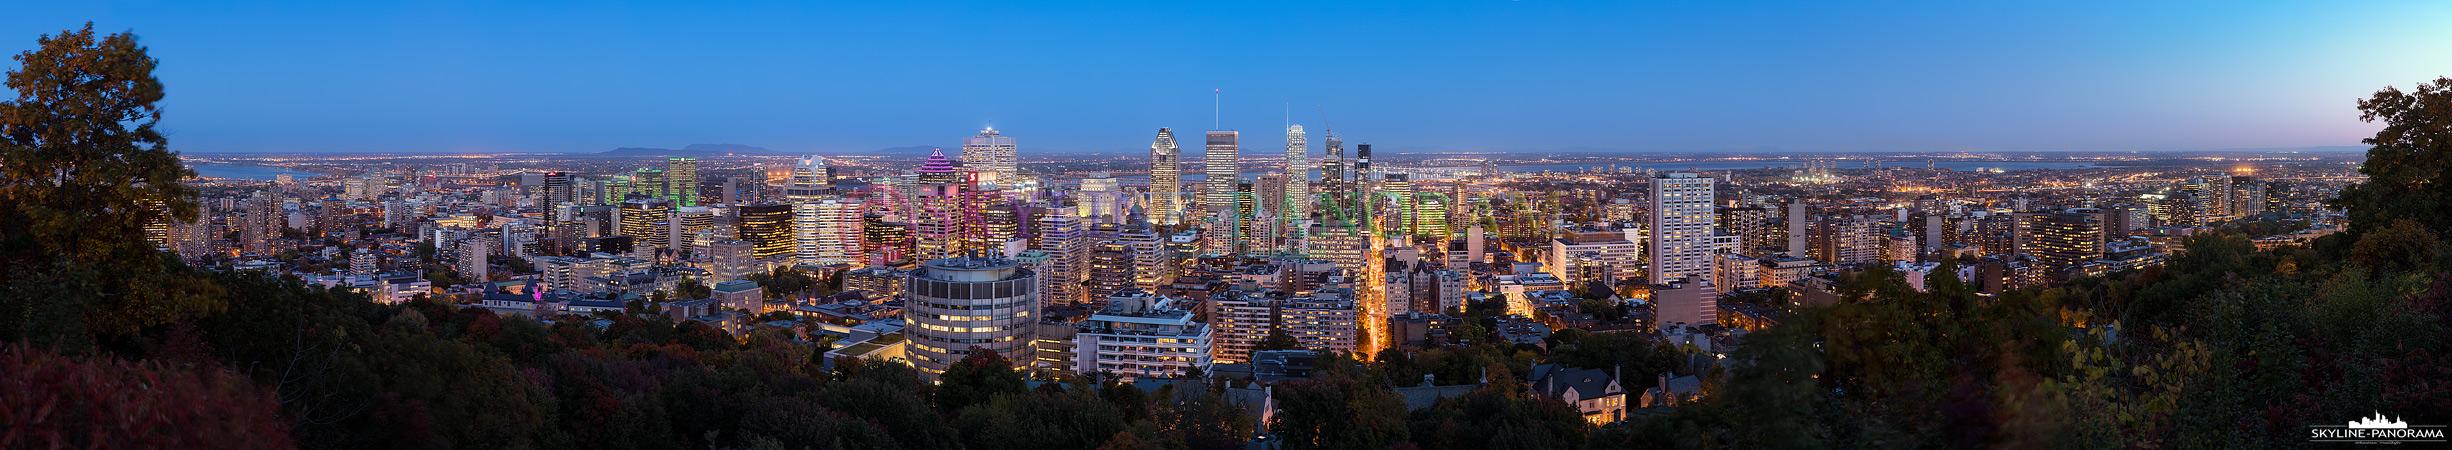 Skyline Montreal vom Mont Royal